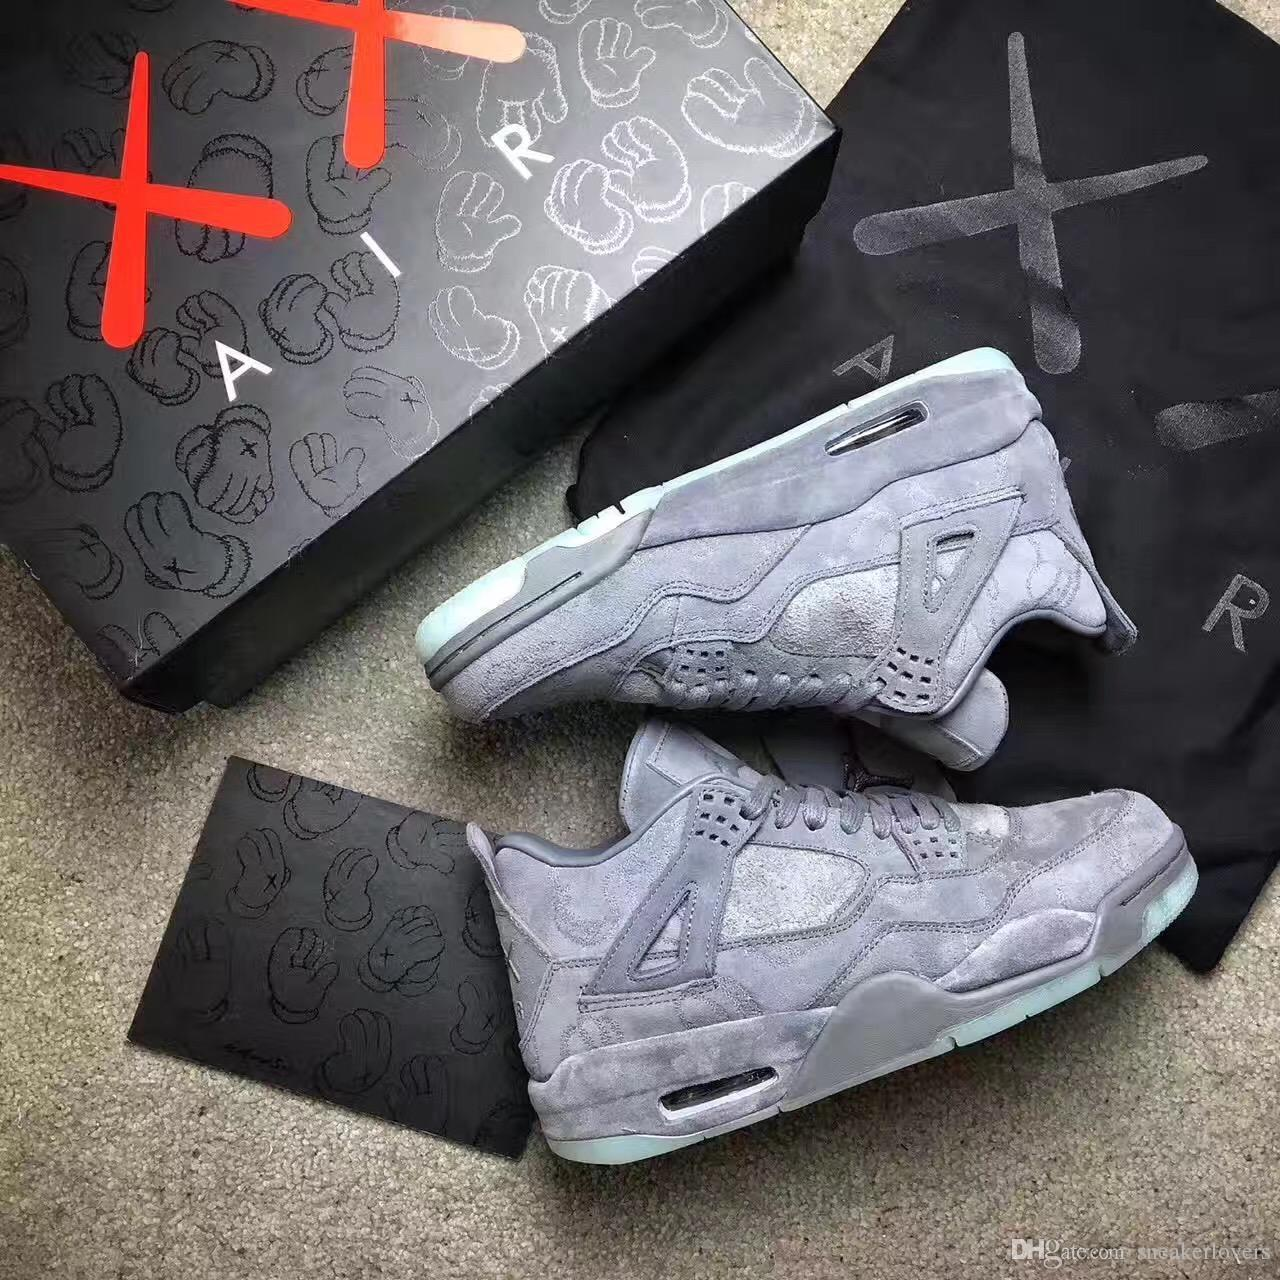 2f5a42dbfae48b WithBox KAWS X Shoes 4 4s XX Kaws Cool Grey White Glow Men Basketball Shoes  White Blue Black Sports Sneakers Discount Shoes Shoe Shops From  Discountsneaker